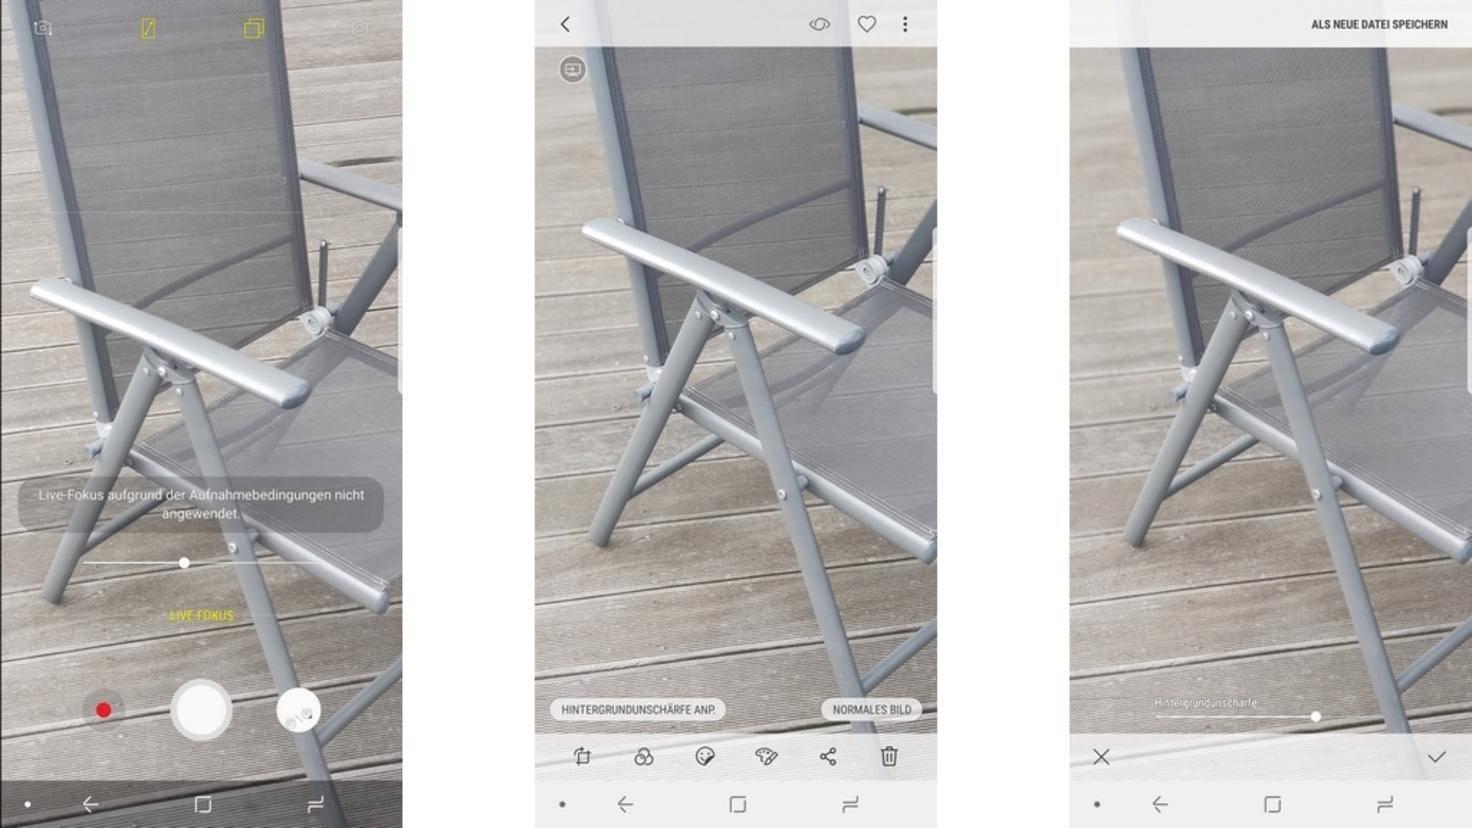 Galaxy-Note-8-Live-Fokus